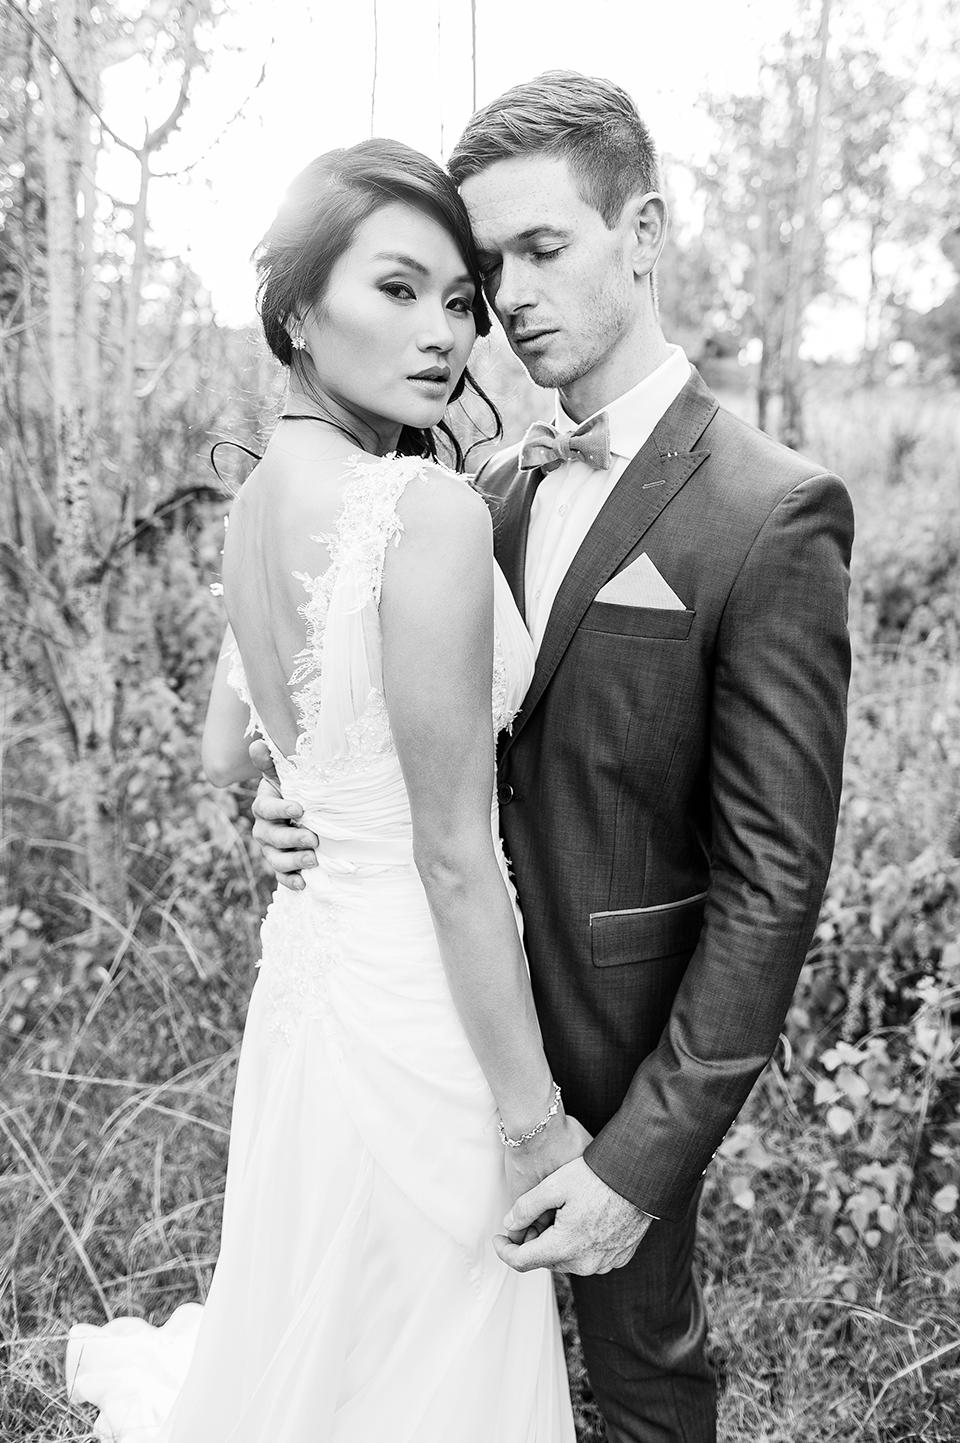 RyanParker_CapeTownPhotographer_Wedding_Pretoria_Vivere_DSC_1562.jpg